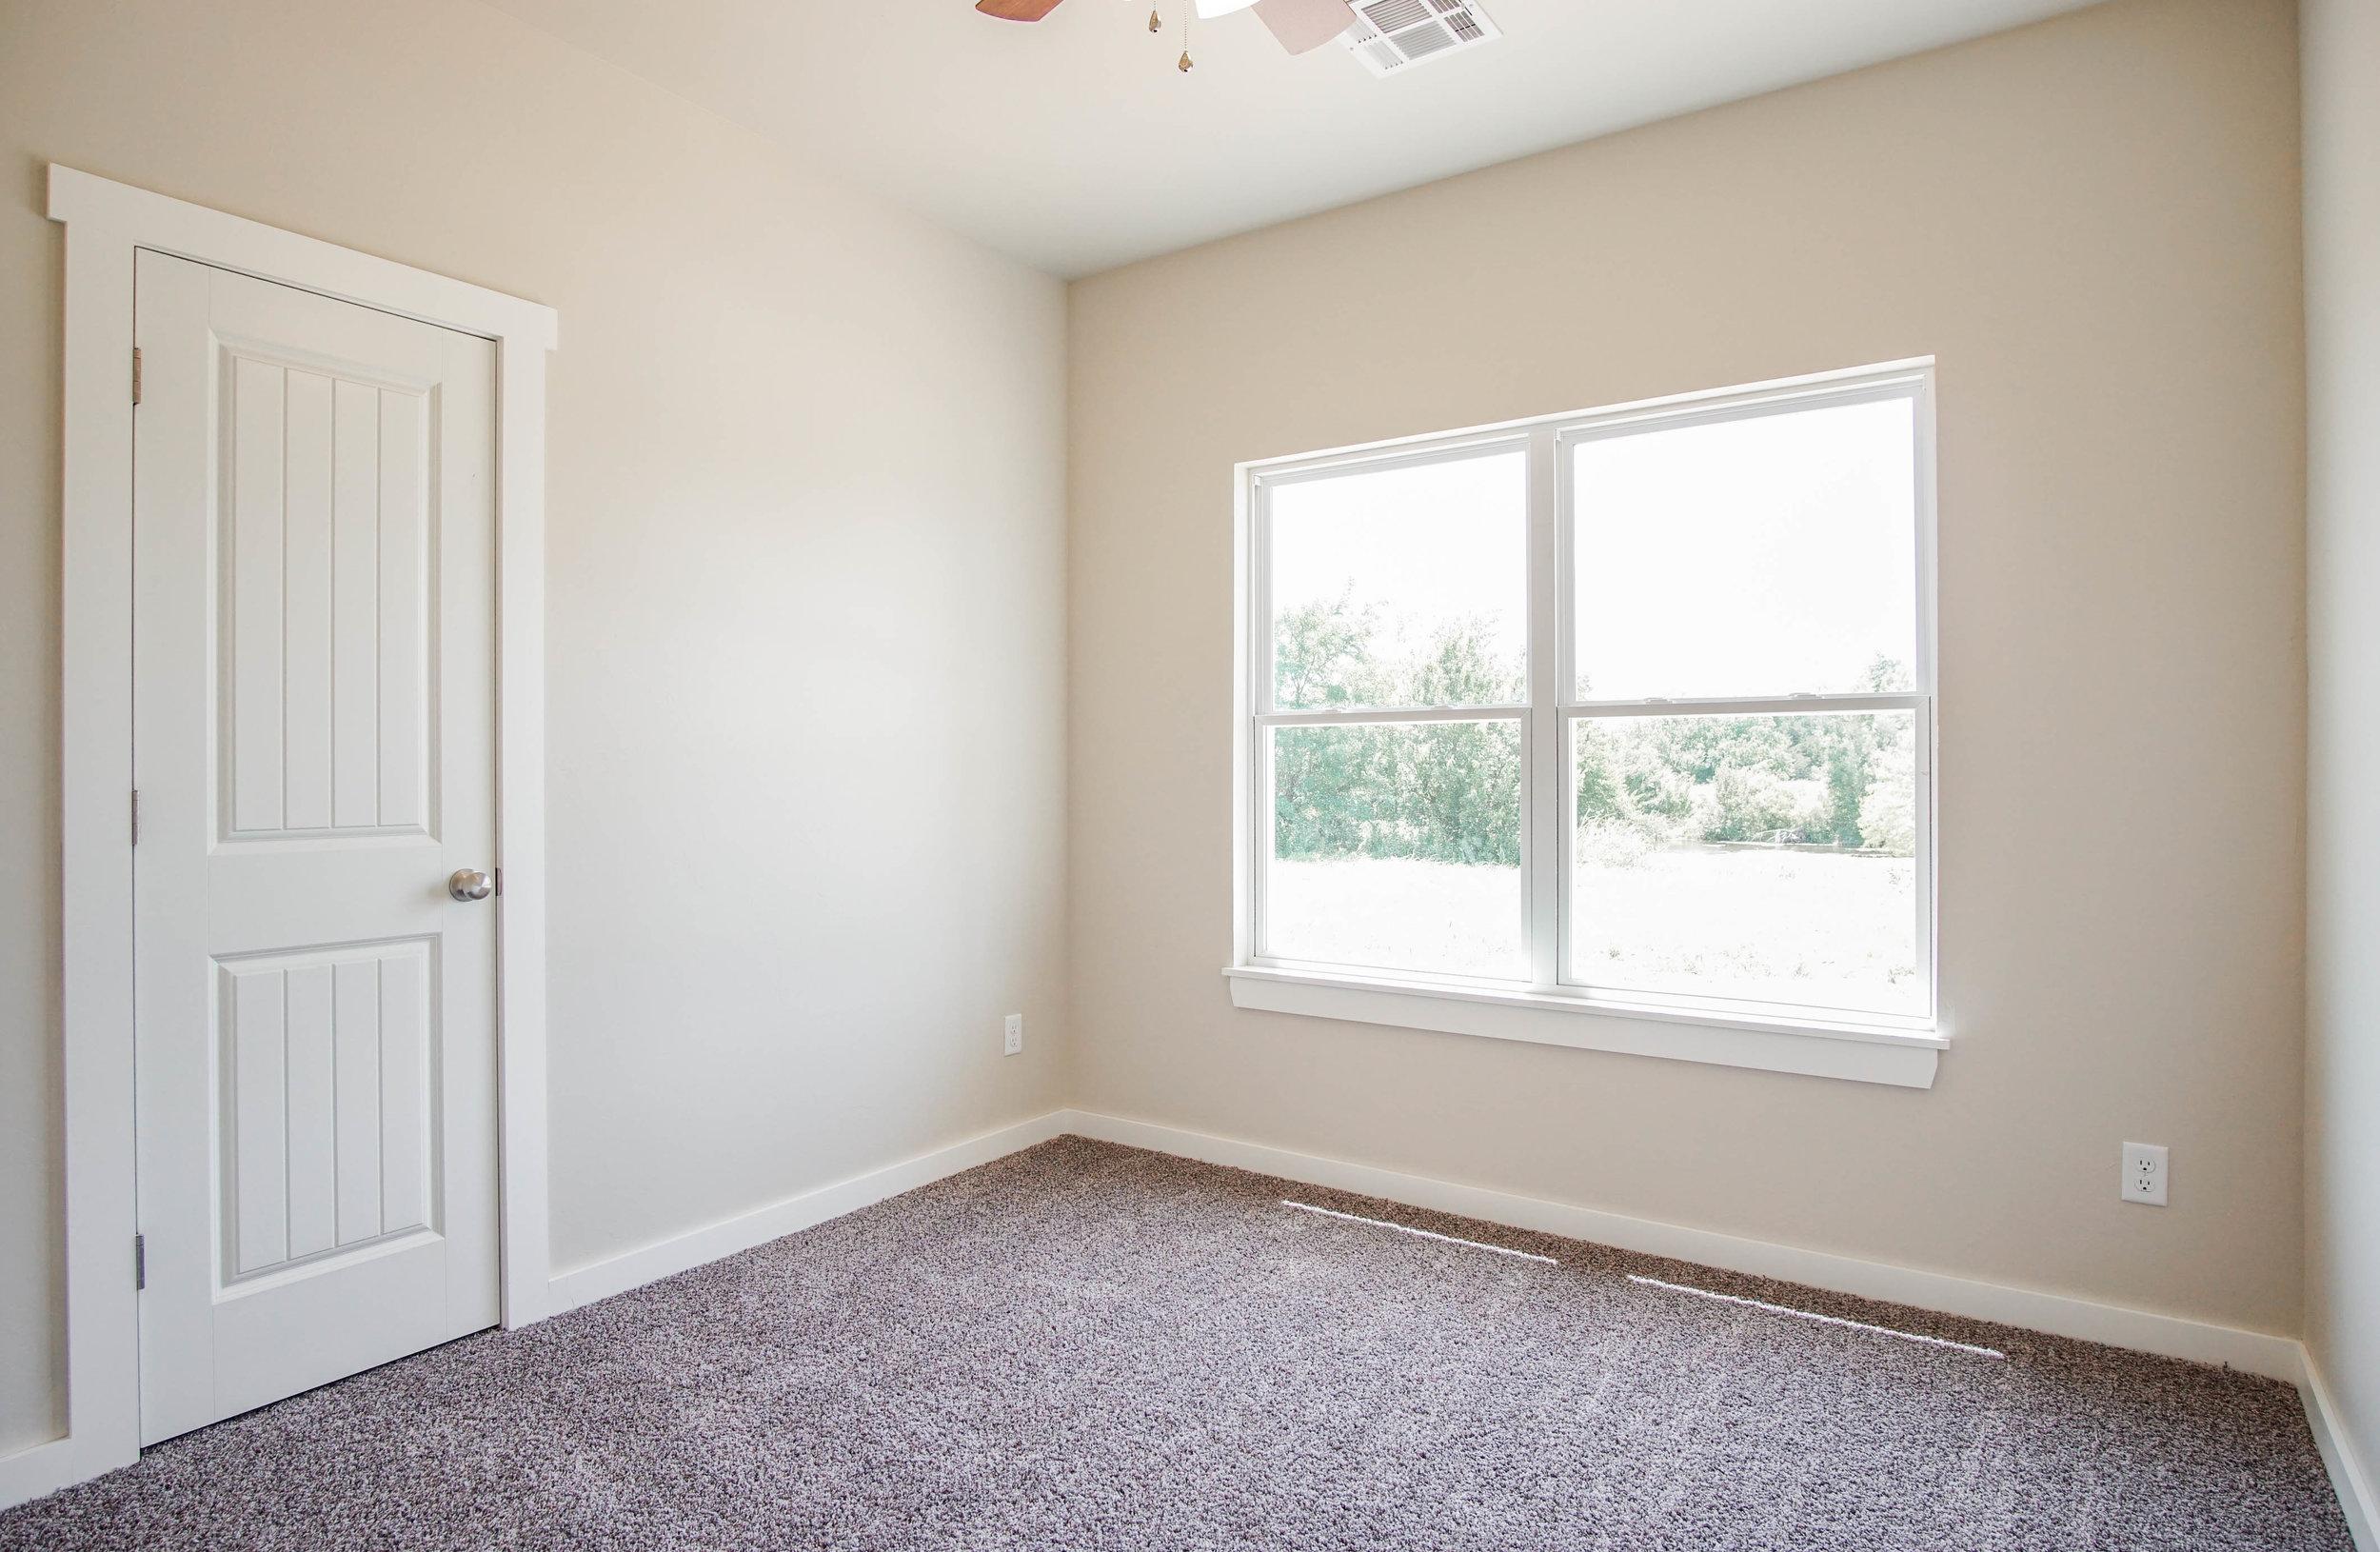 53 Bedroom 4.jpg